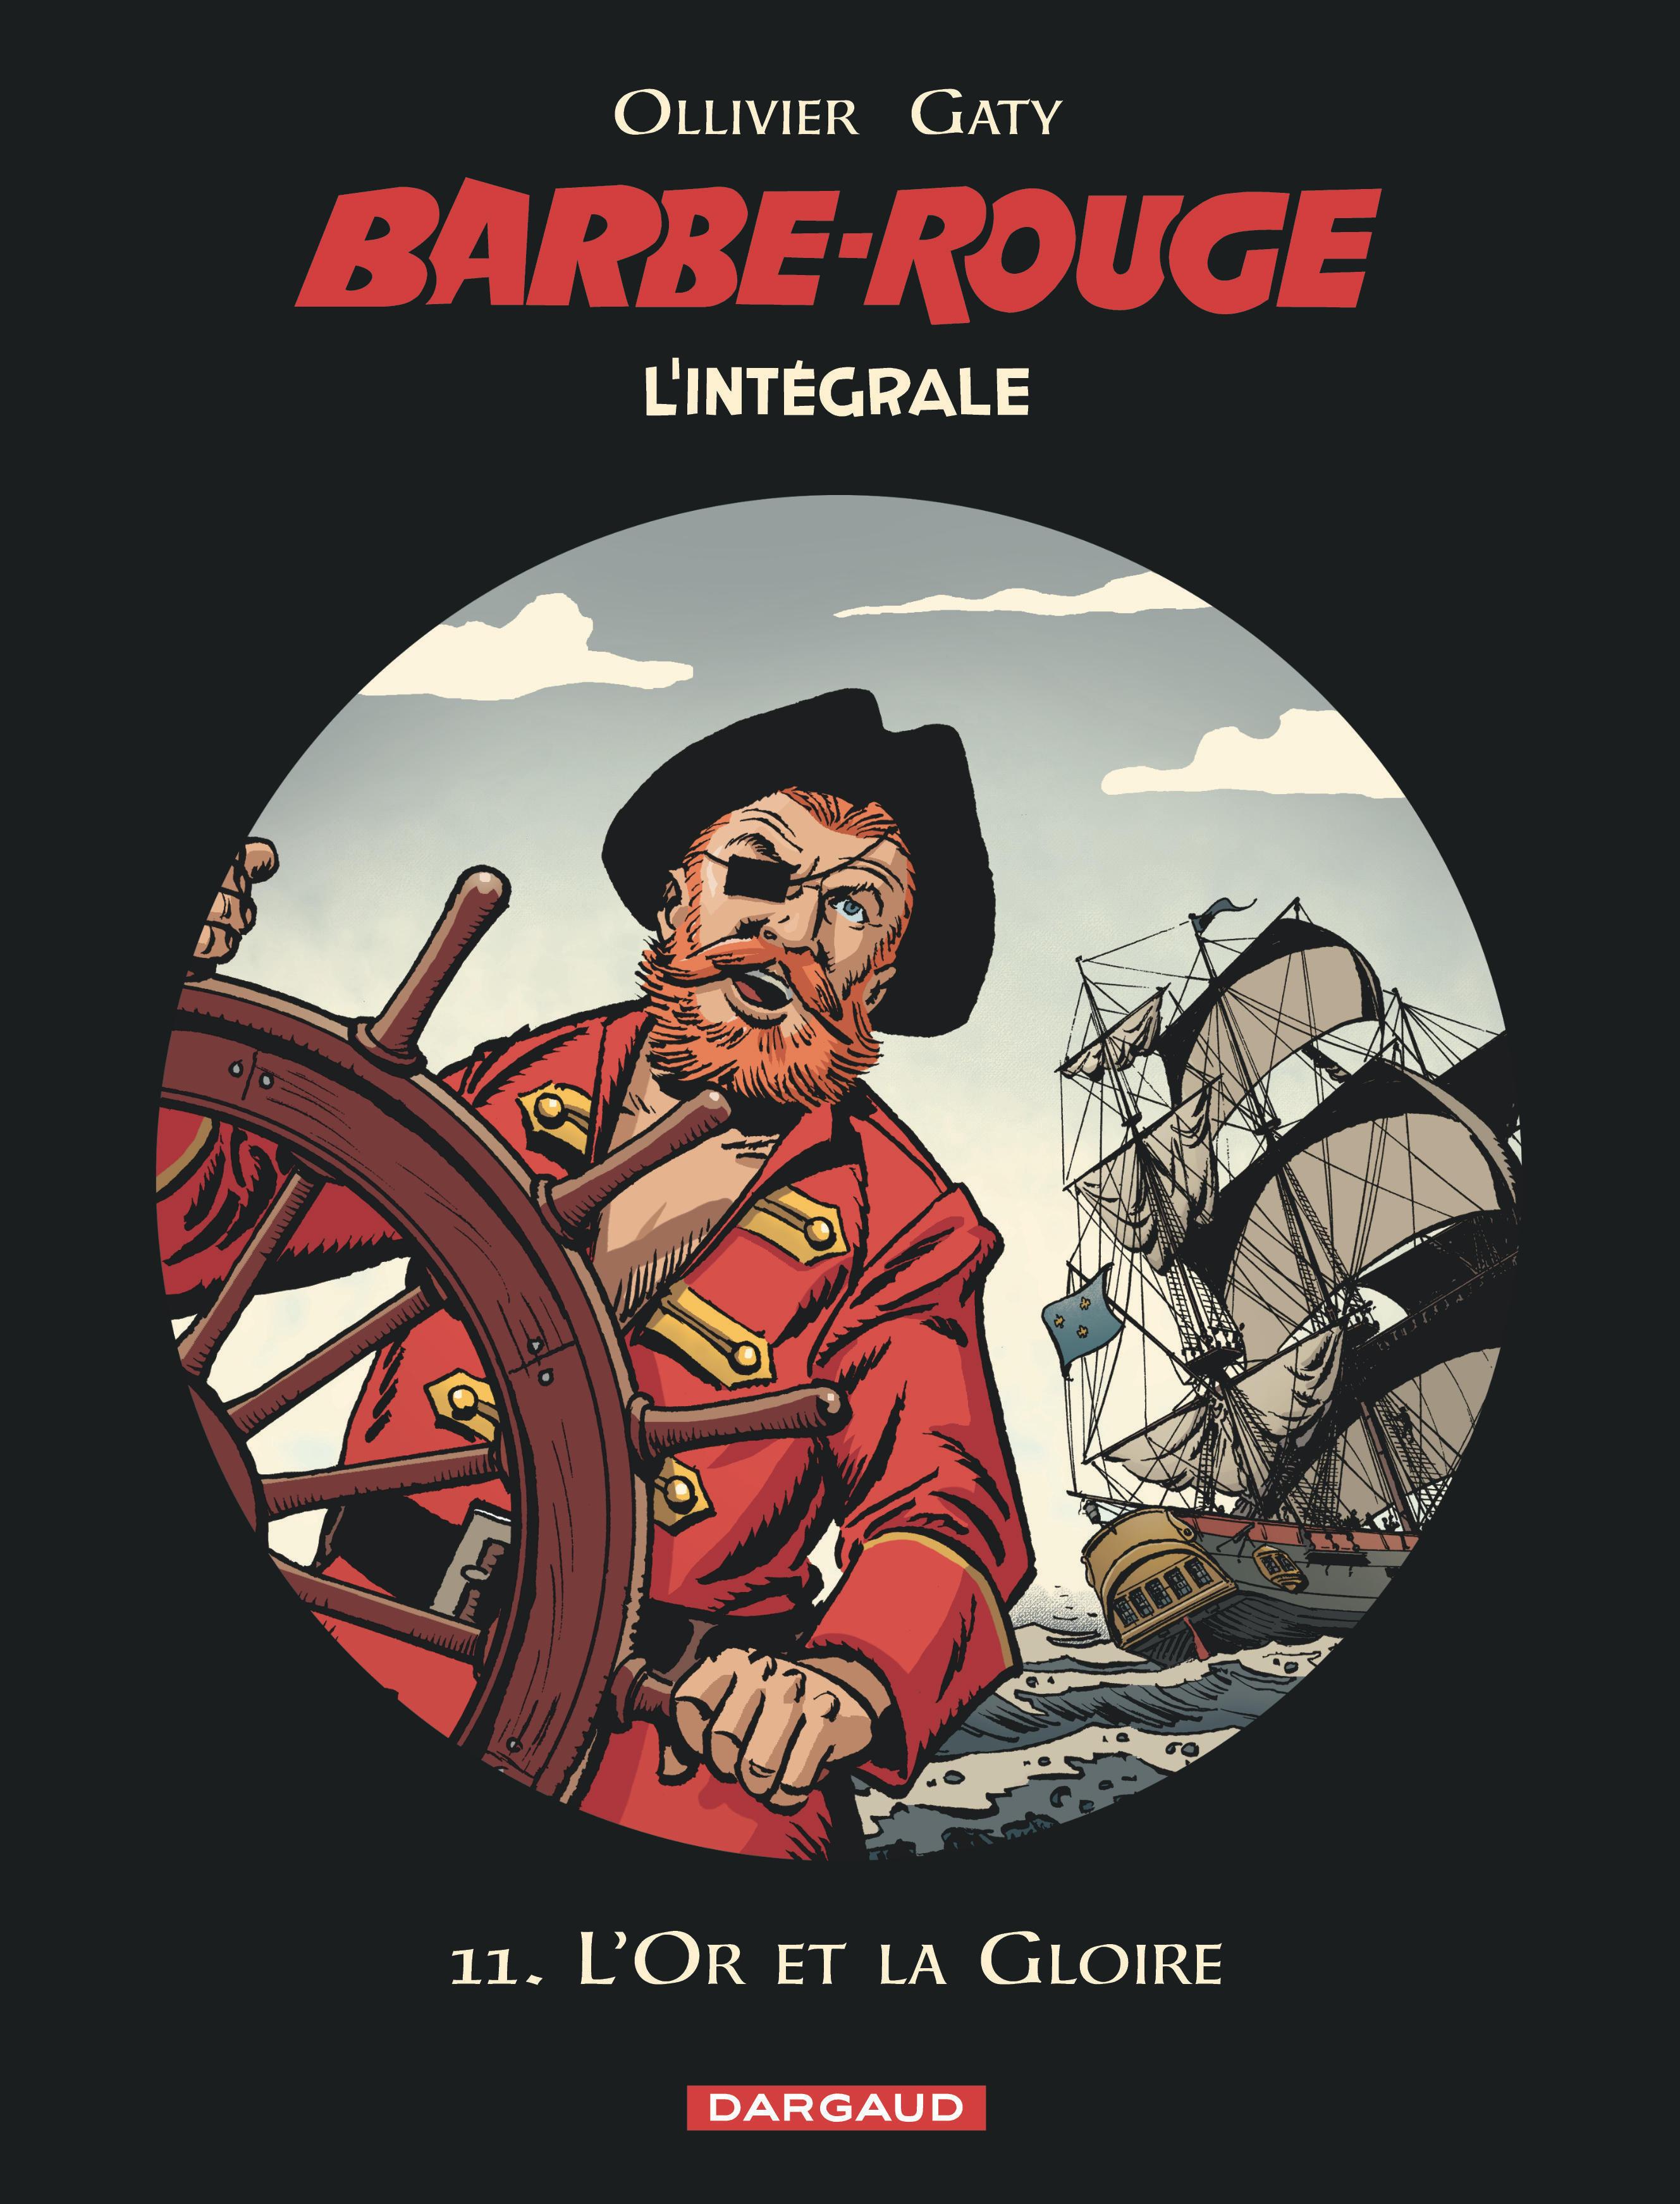 BARBE-ROUGE - INTEGRALES - TOME 11 - L'OR ET LA GLOIRE